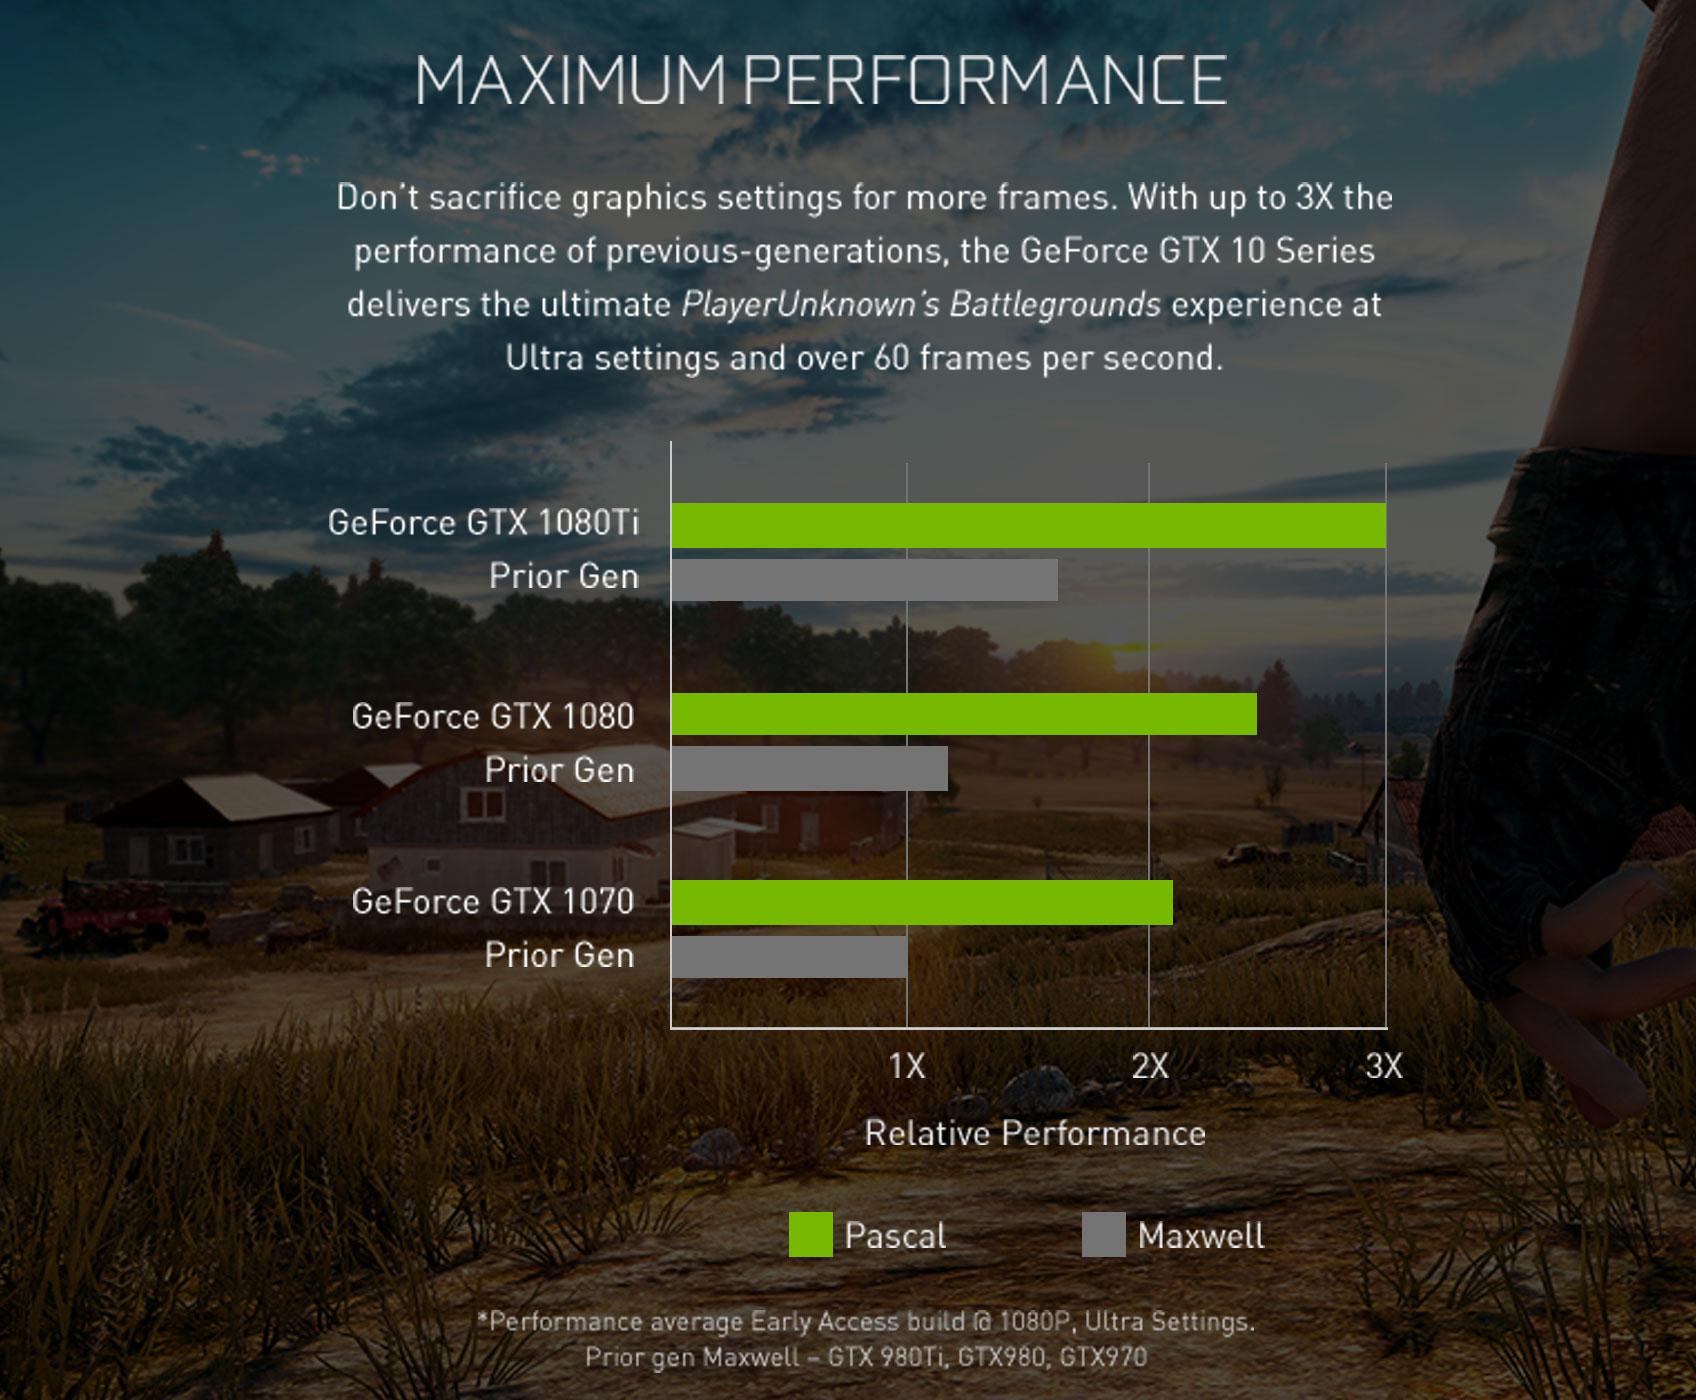 NvidiaPerf